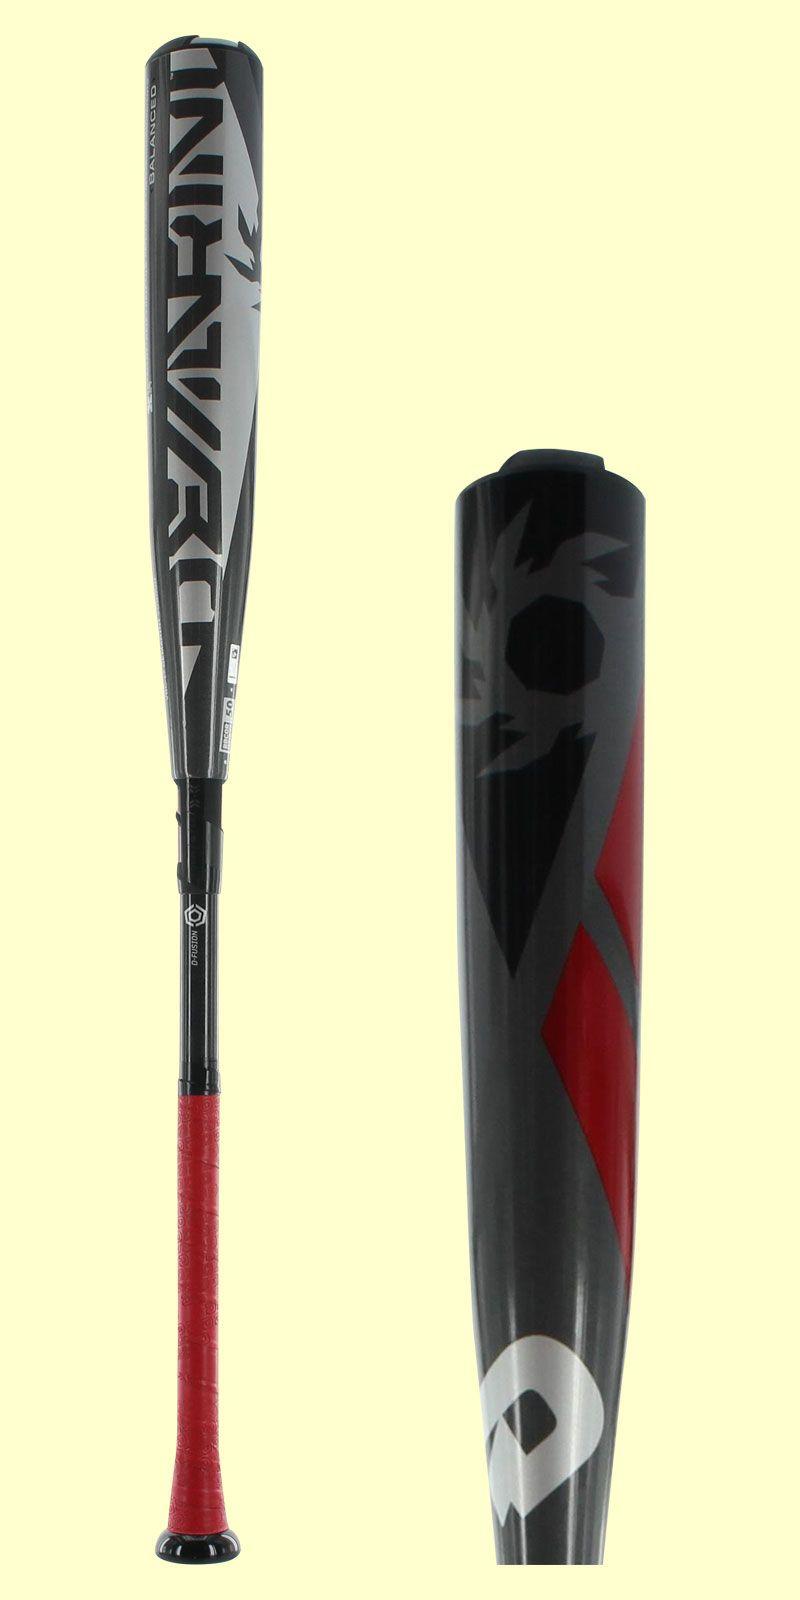 2017 DeMarini Voodoo BBCOR Baseball Bat  DXVBC  cd69f54b9